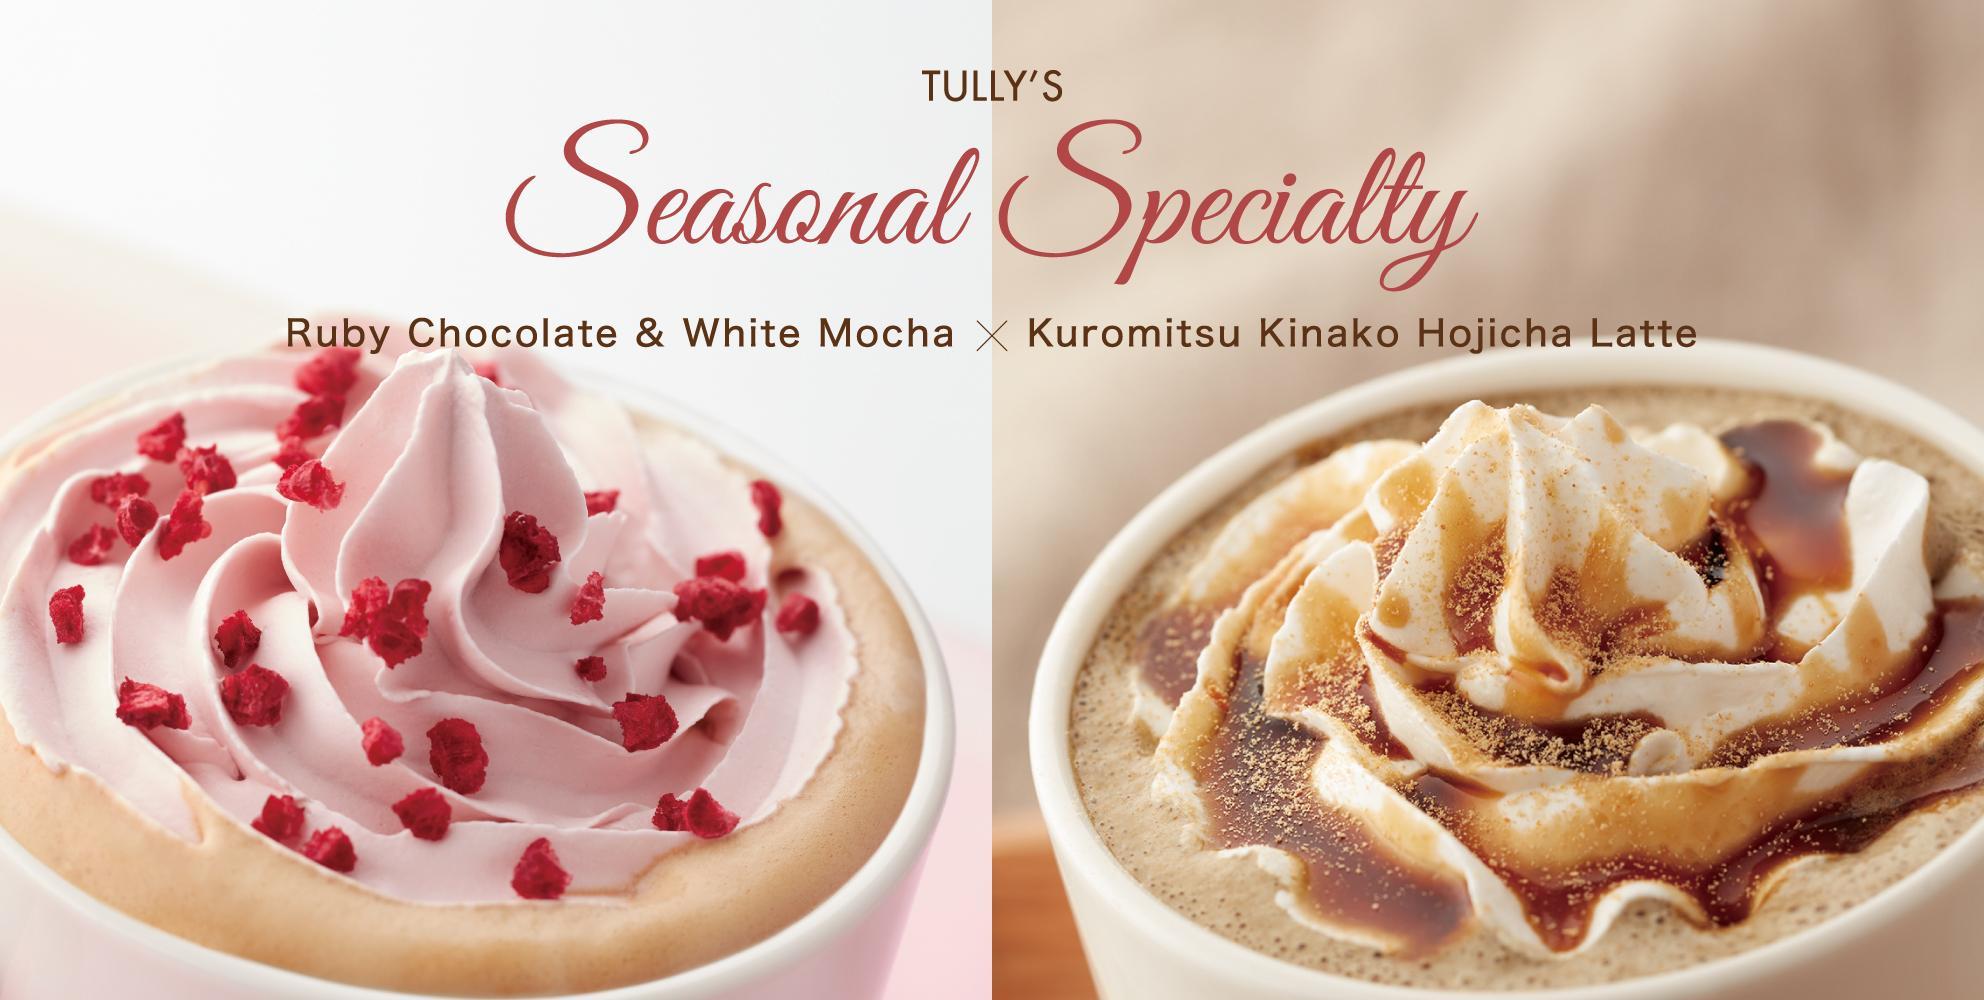 Seasonal Specialty